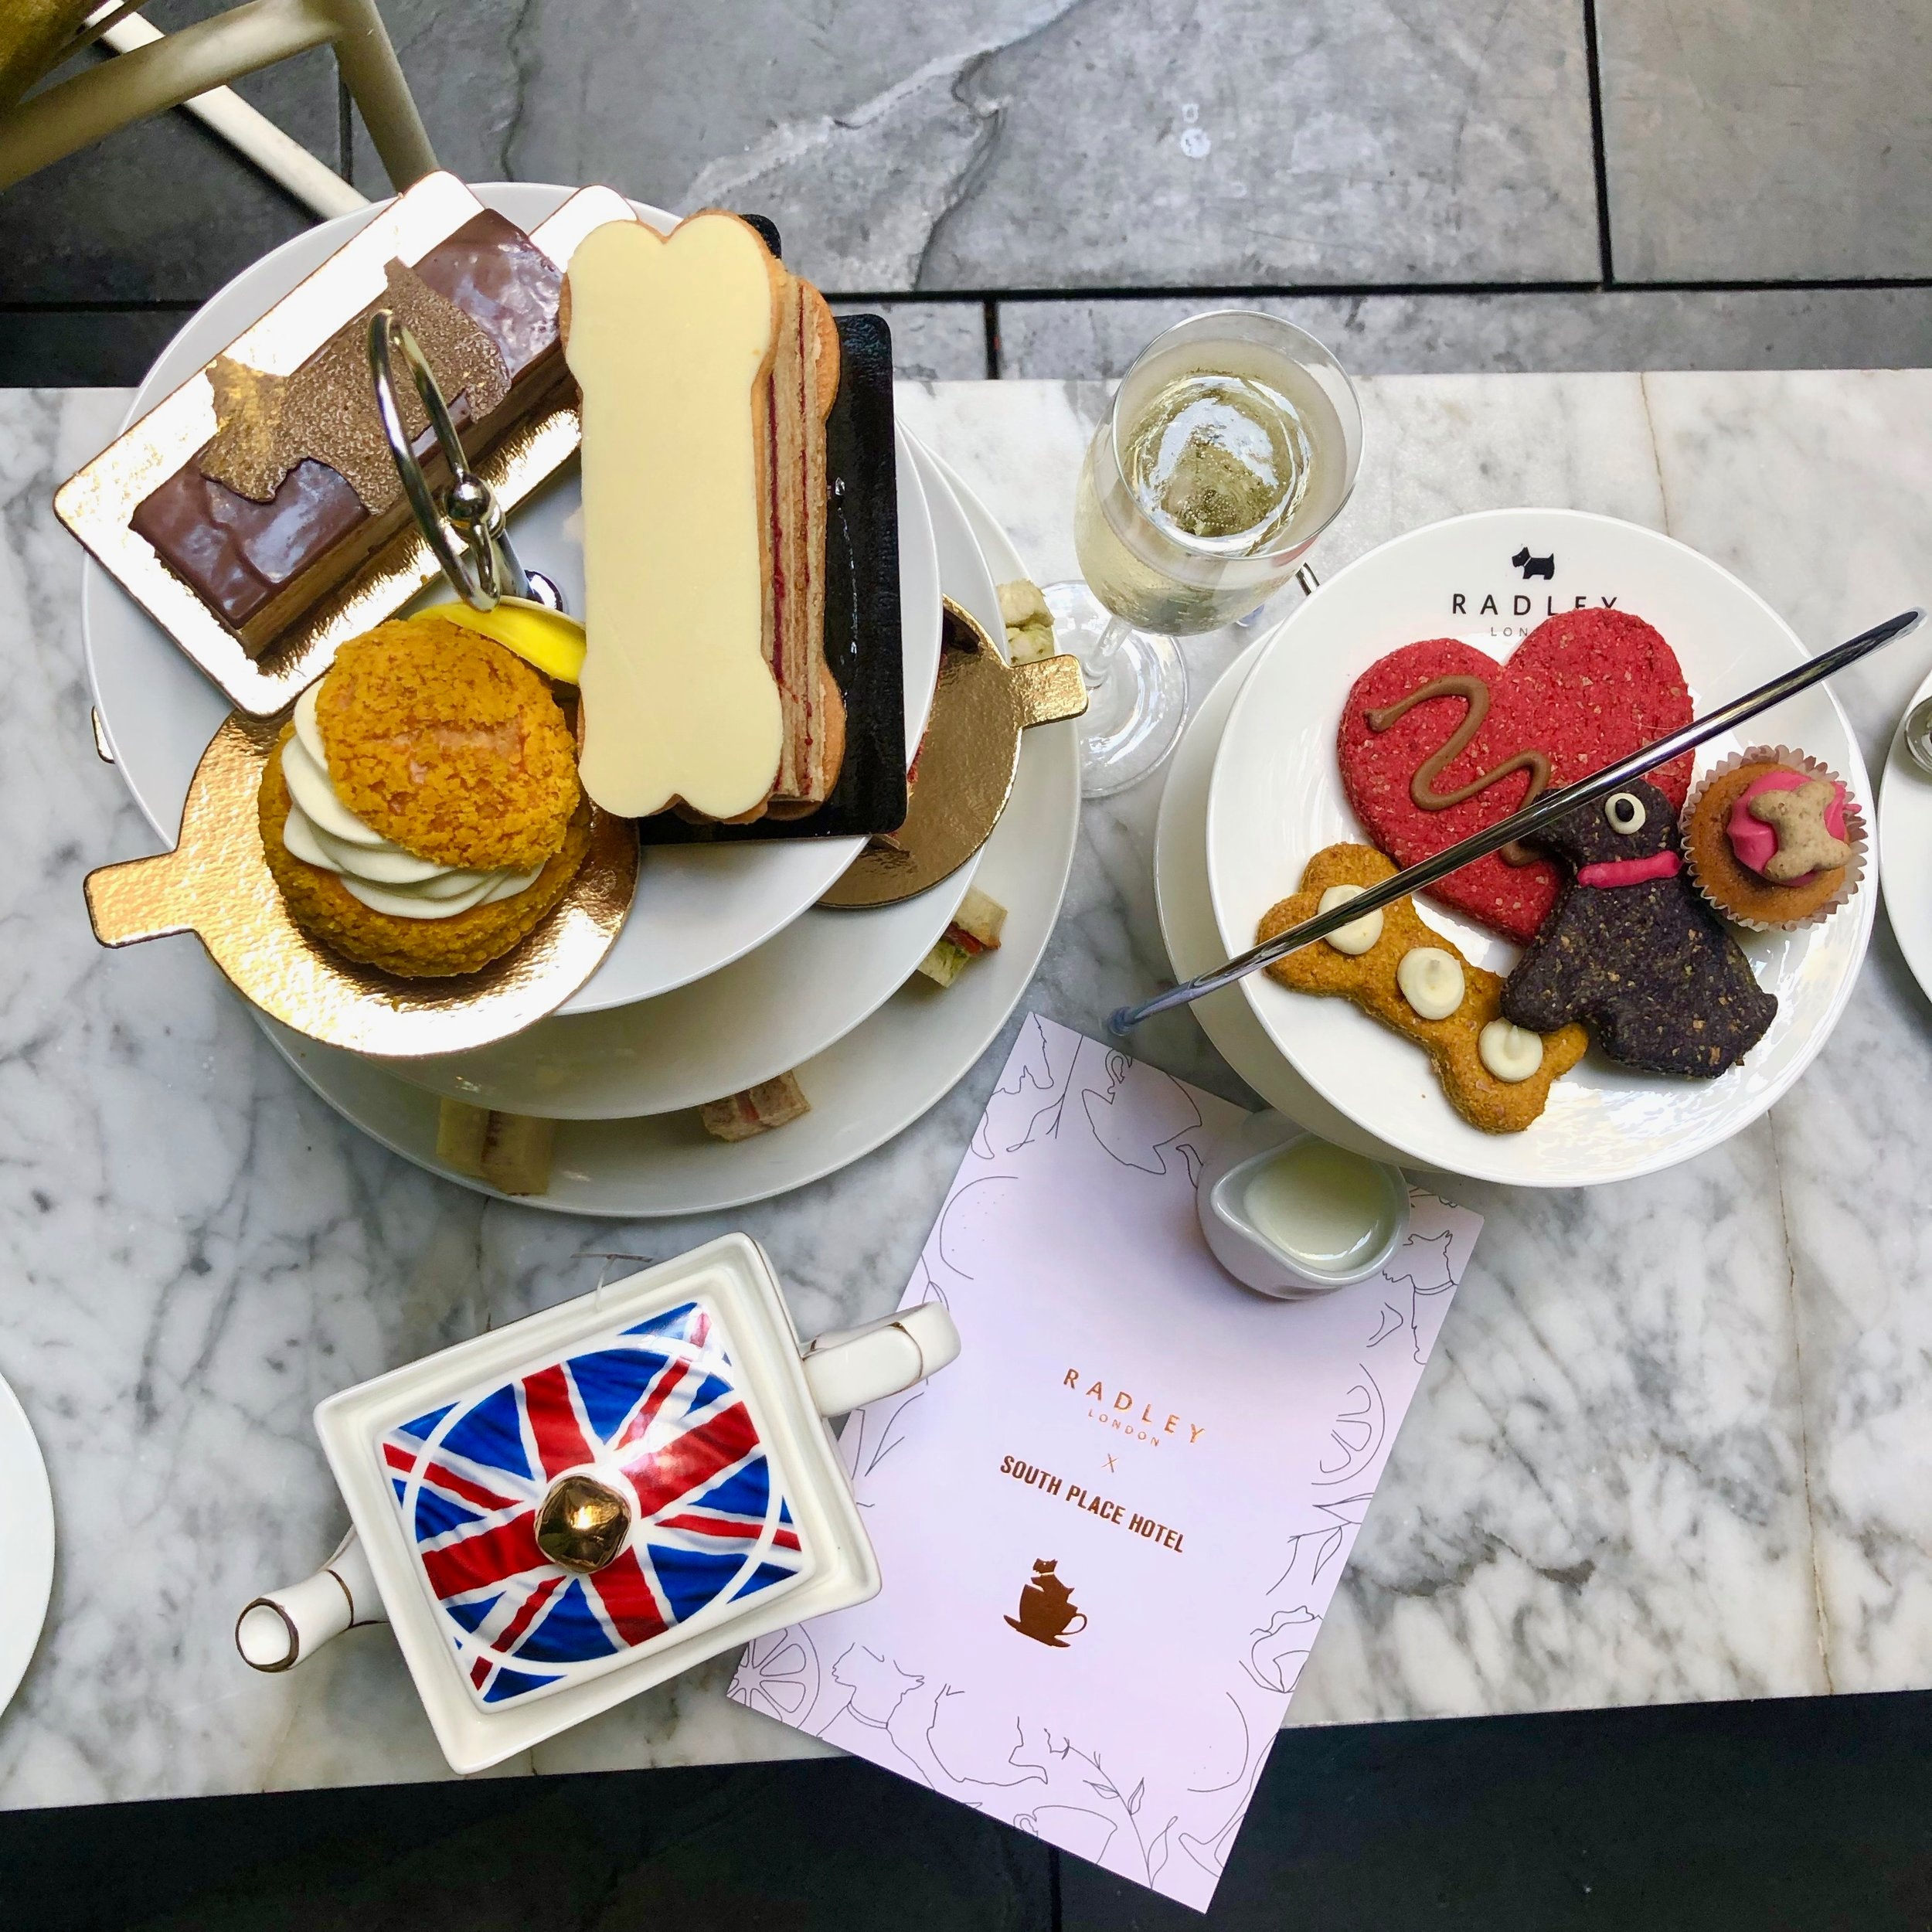 south+place+hotel+radley+afternoon+tea+dog+friendly+london.jpg